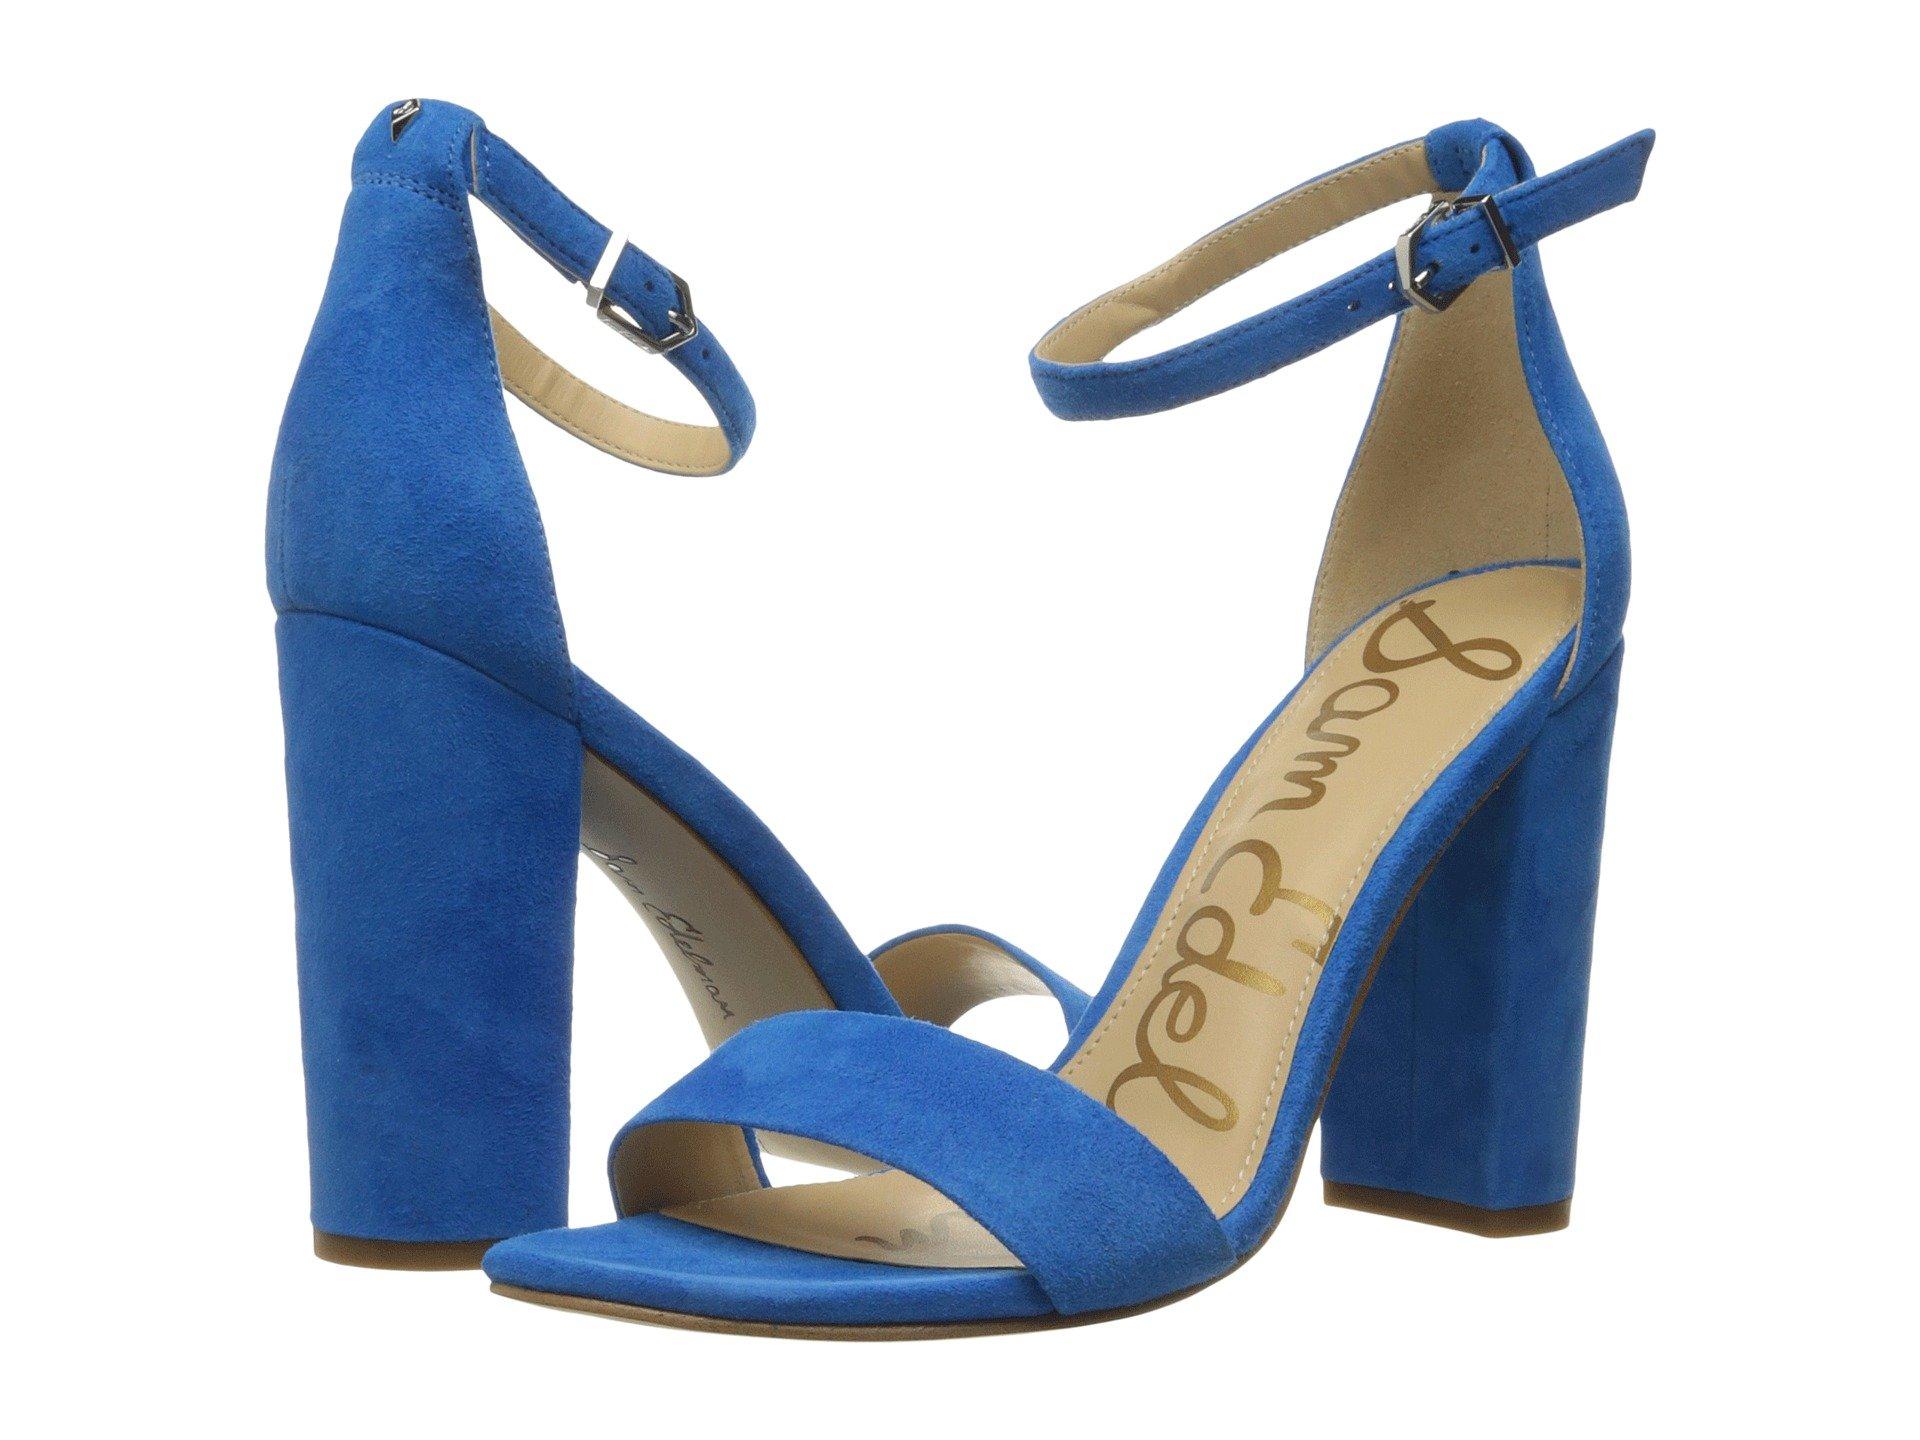 bb719f7b1 Sam Edelman Yaro Ankle Strap Sandal Heel